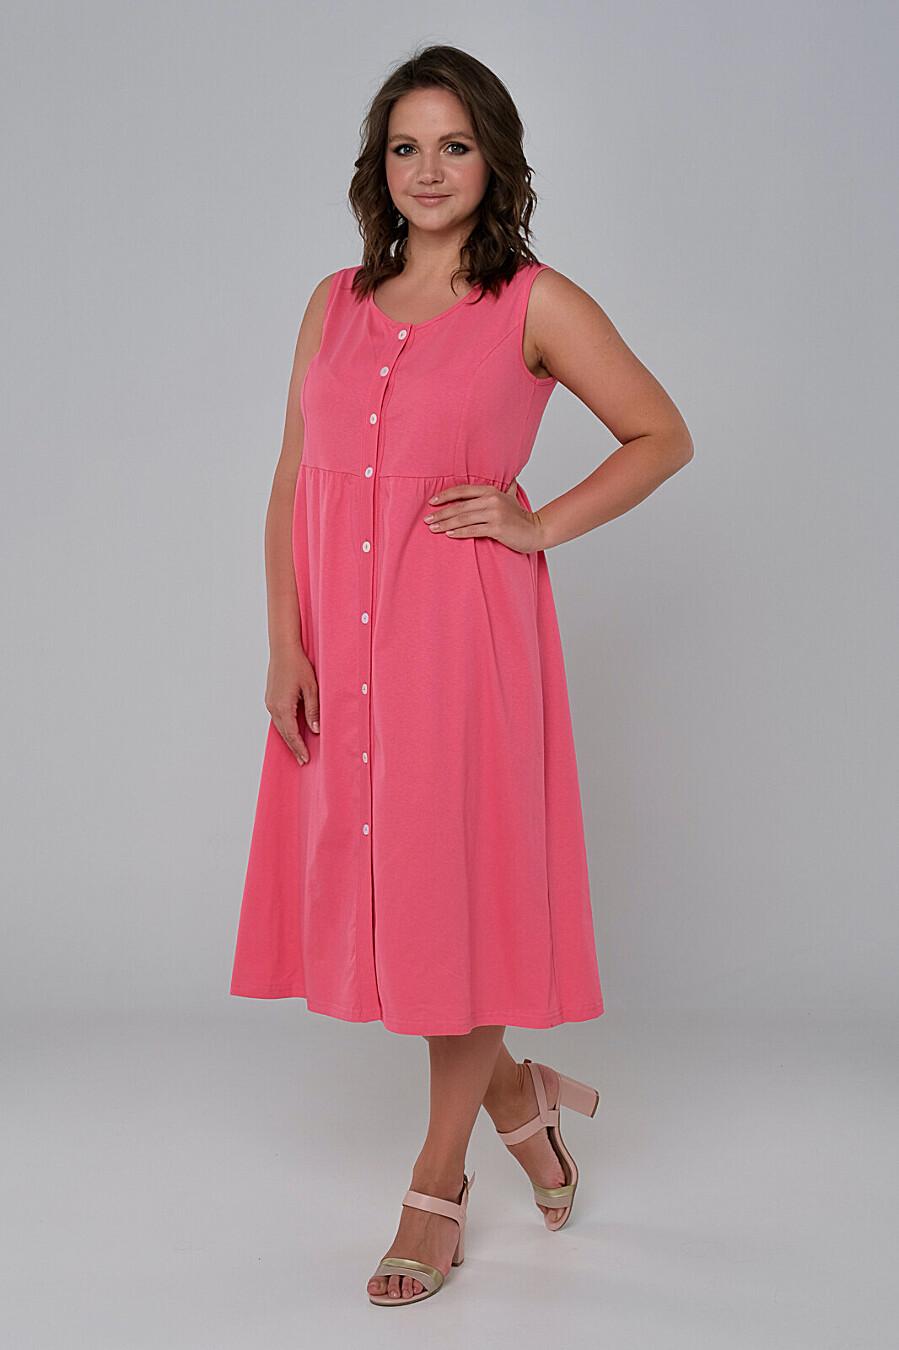 Сарафан  ODEVAITE (272679), купить в Moyo.moda